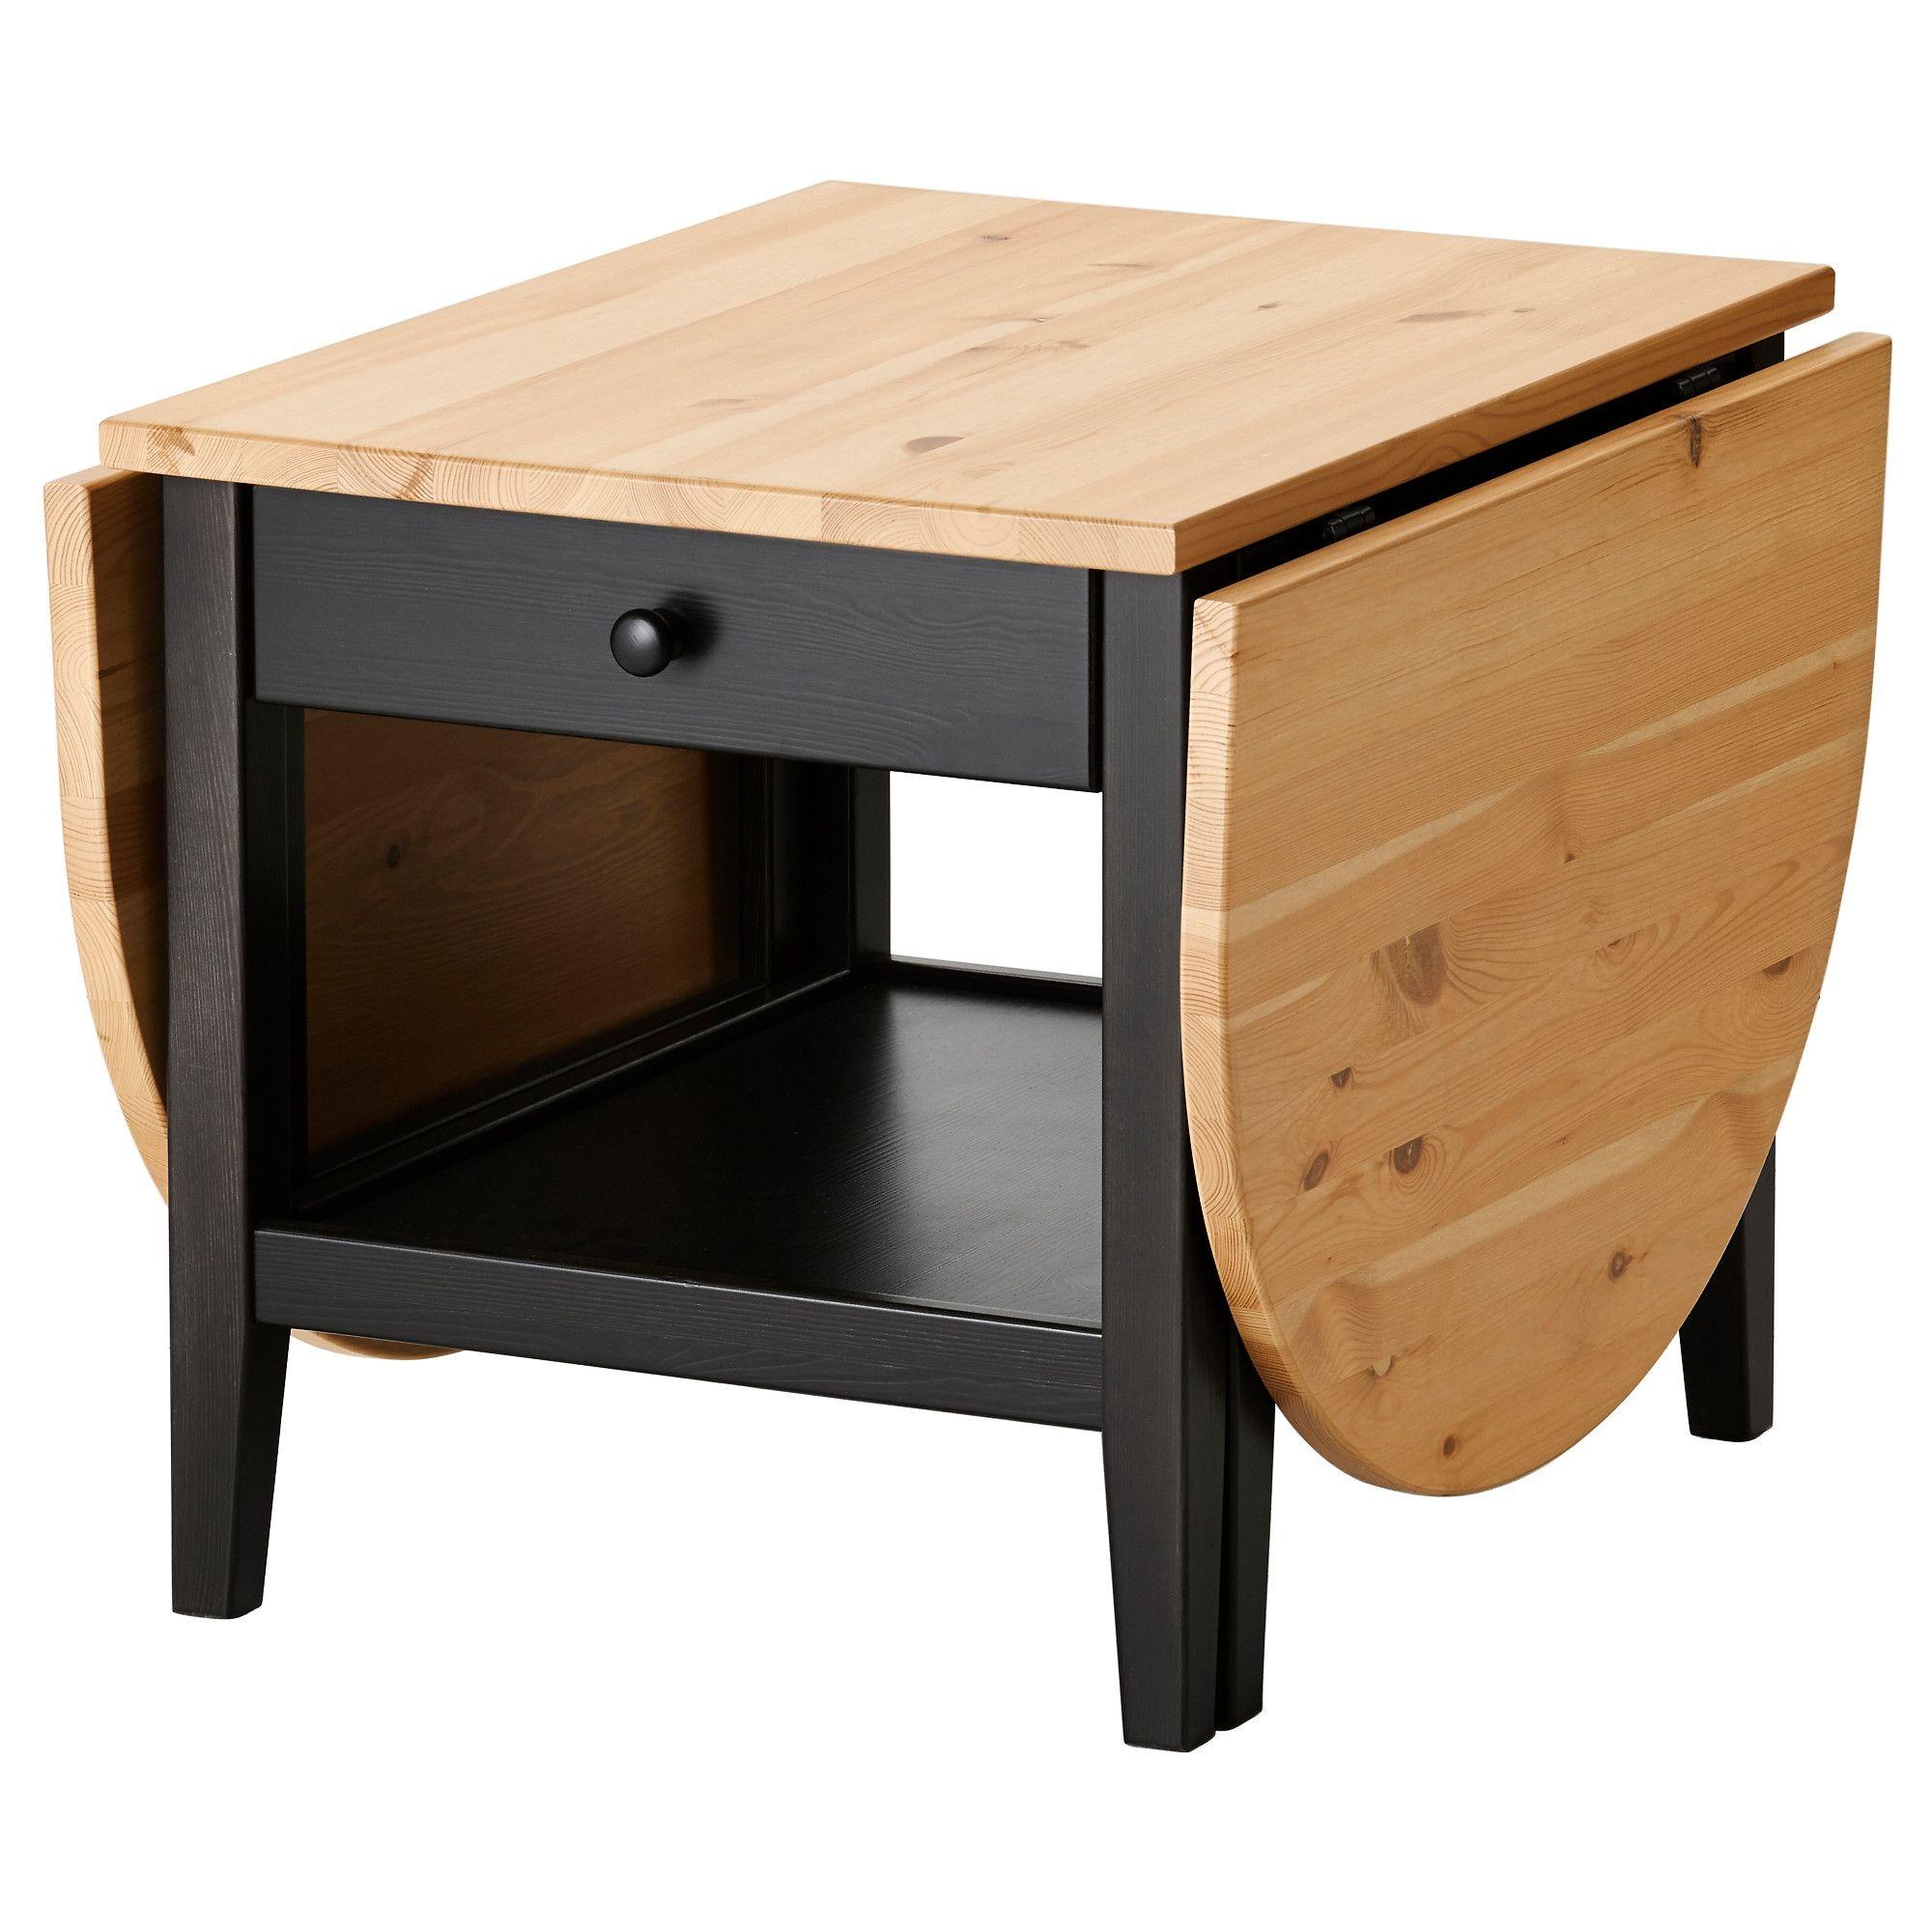 Pine folding coffee table httpbrutabolin pinterest pine folding coffee table geotapseo Images